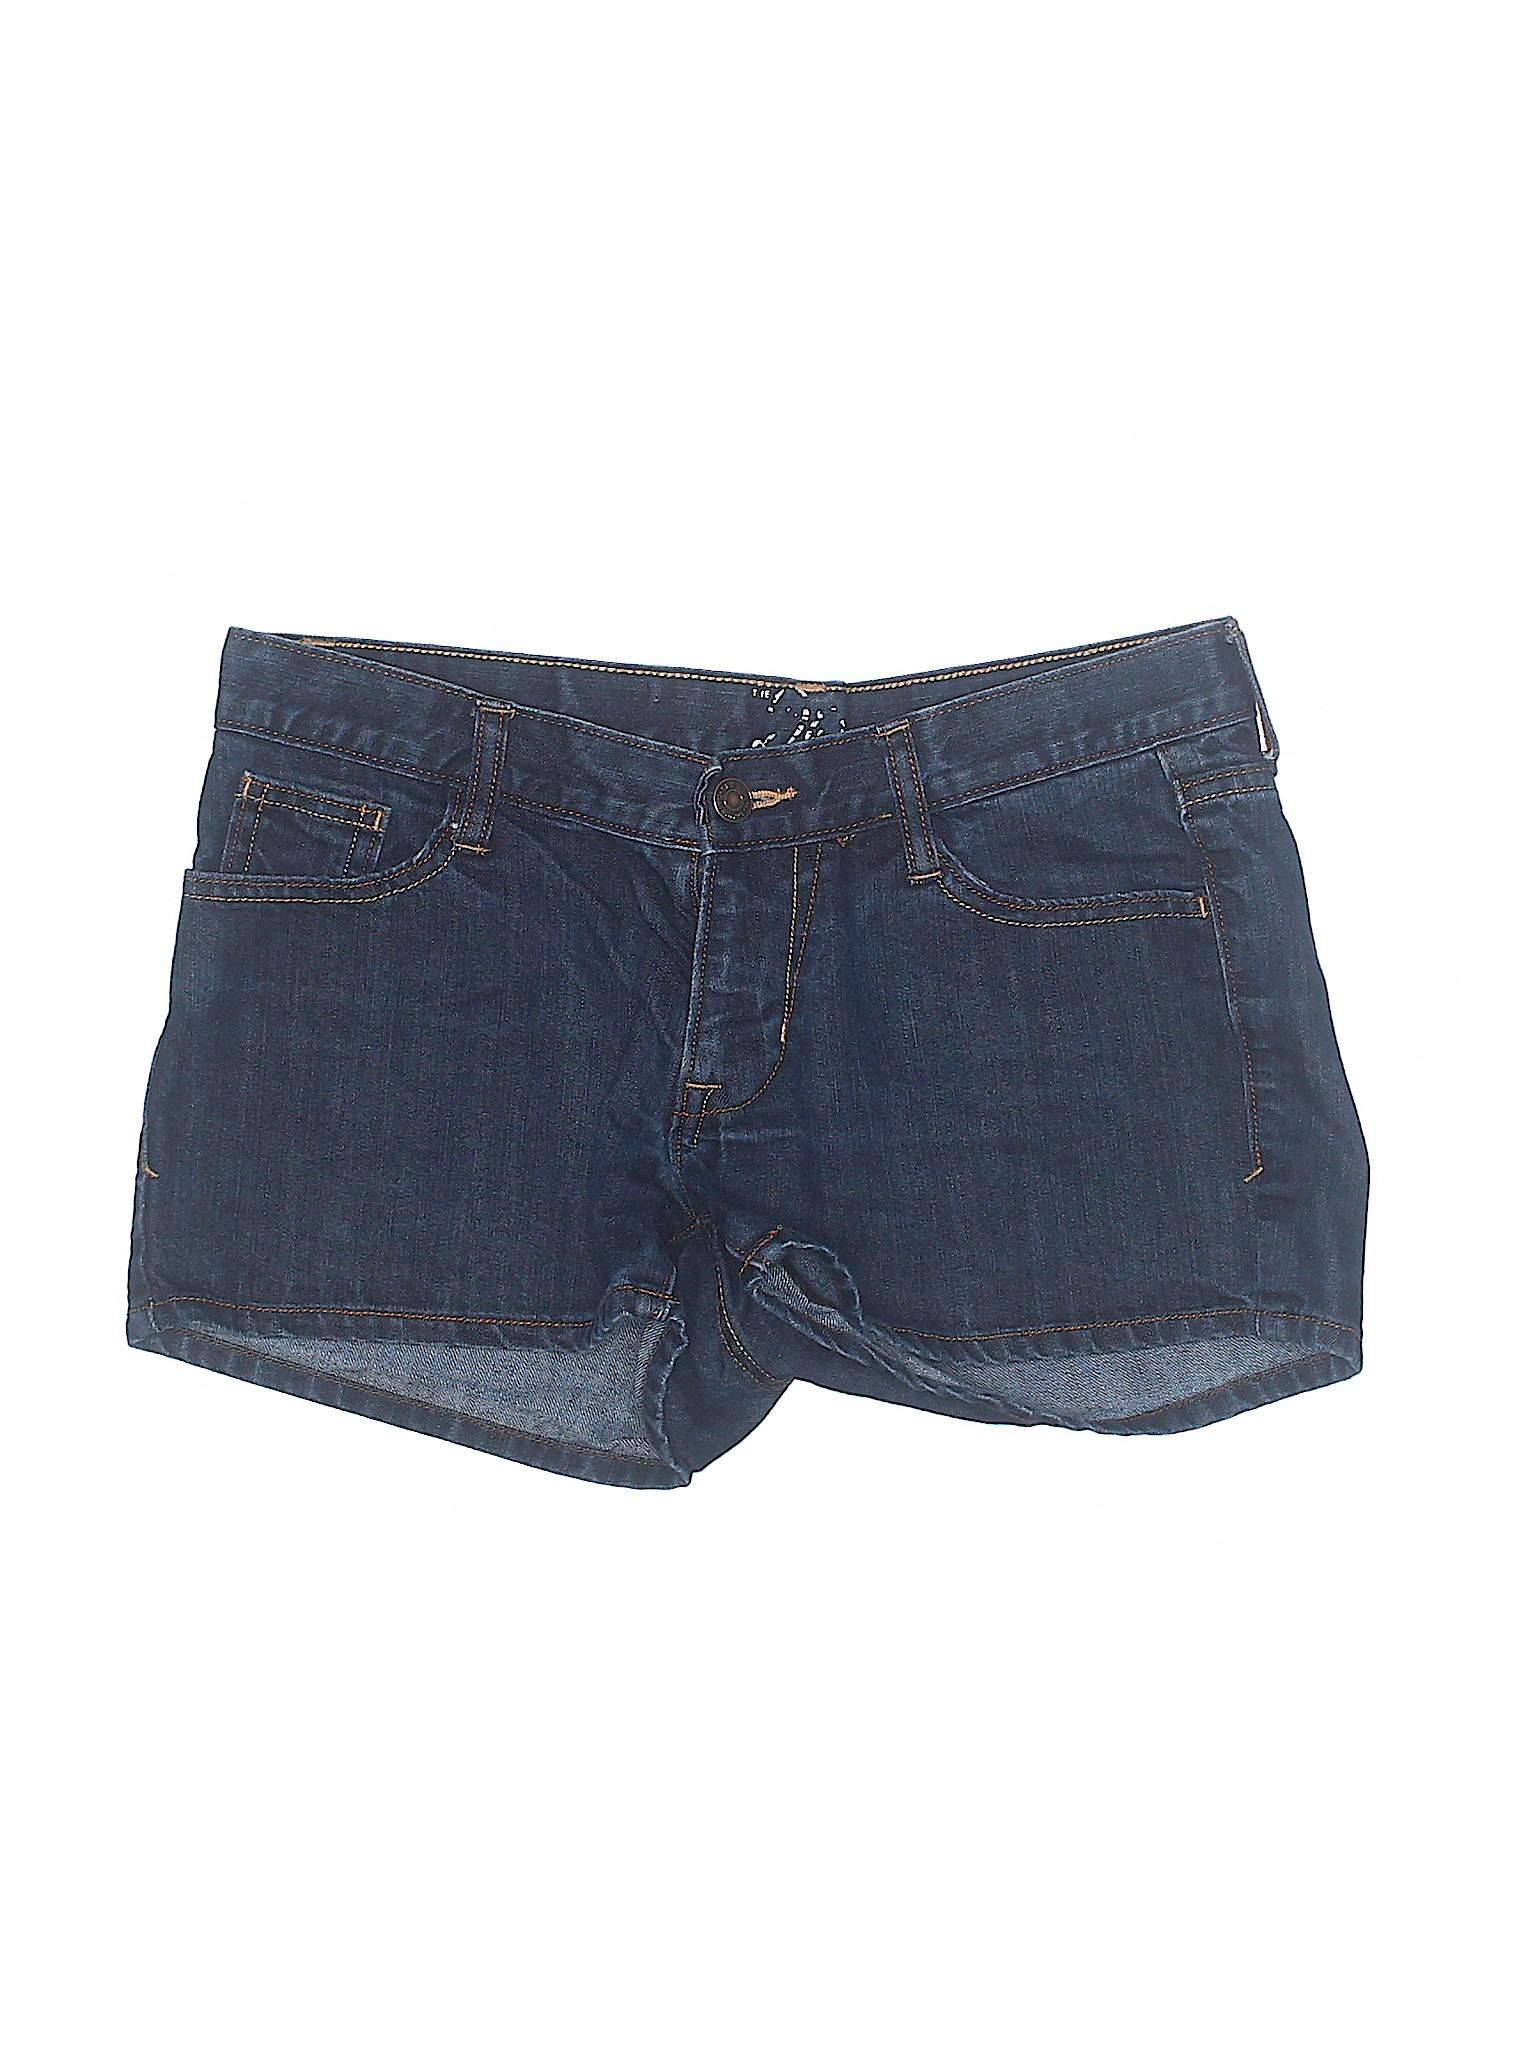 Denim leisure Navy Old Shorts Boutique ZSzqBwx